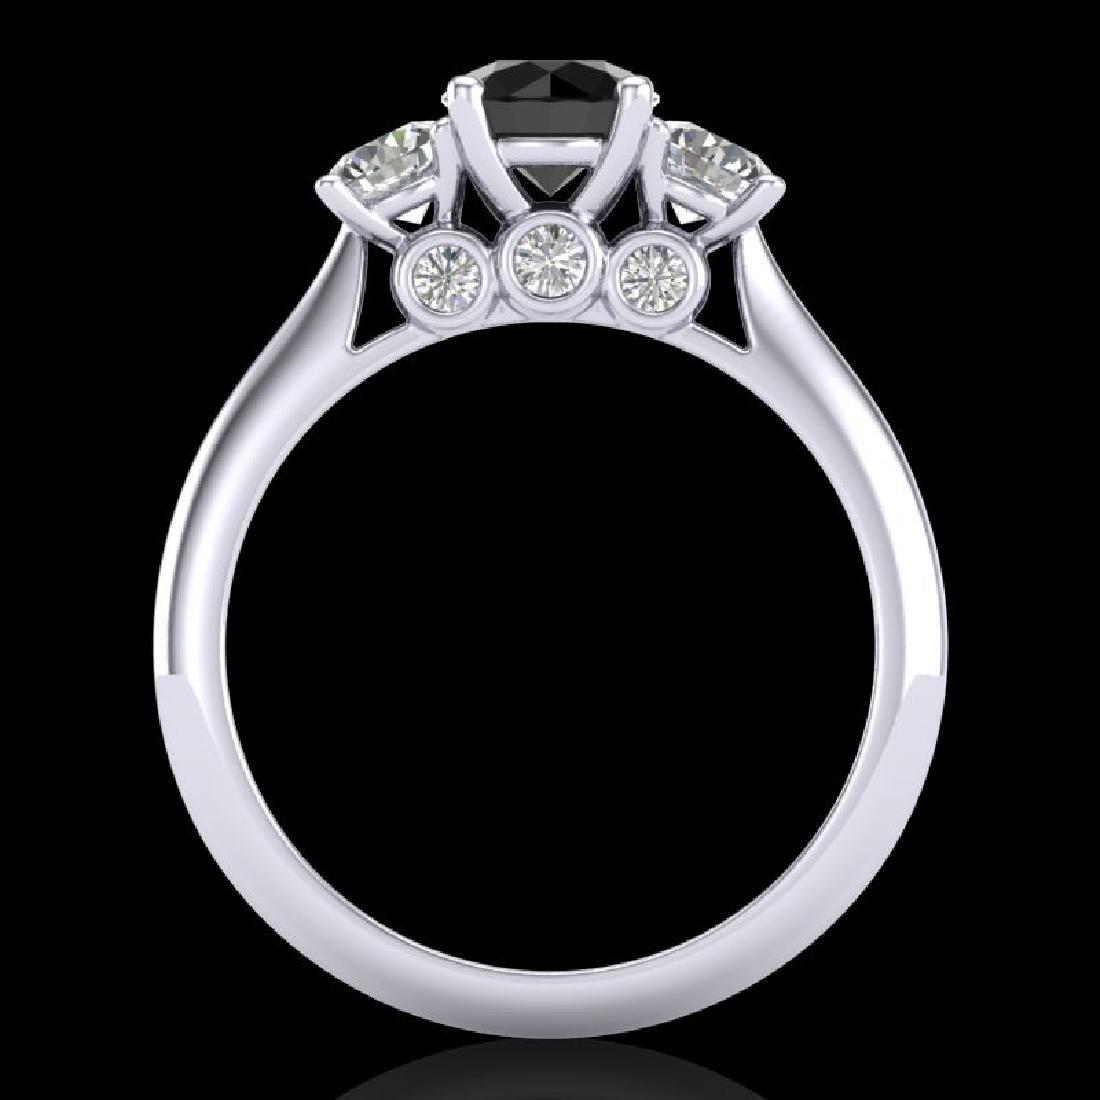 1.5 CTW Fancy Black Diamond Solitaire Art Deco 3 Stone - 3